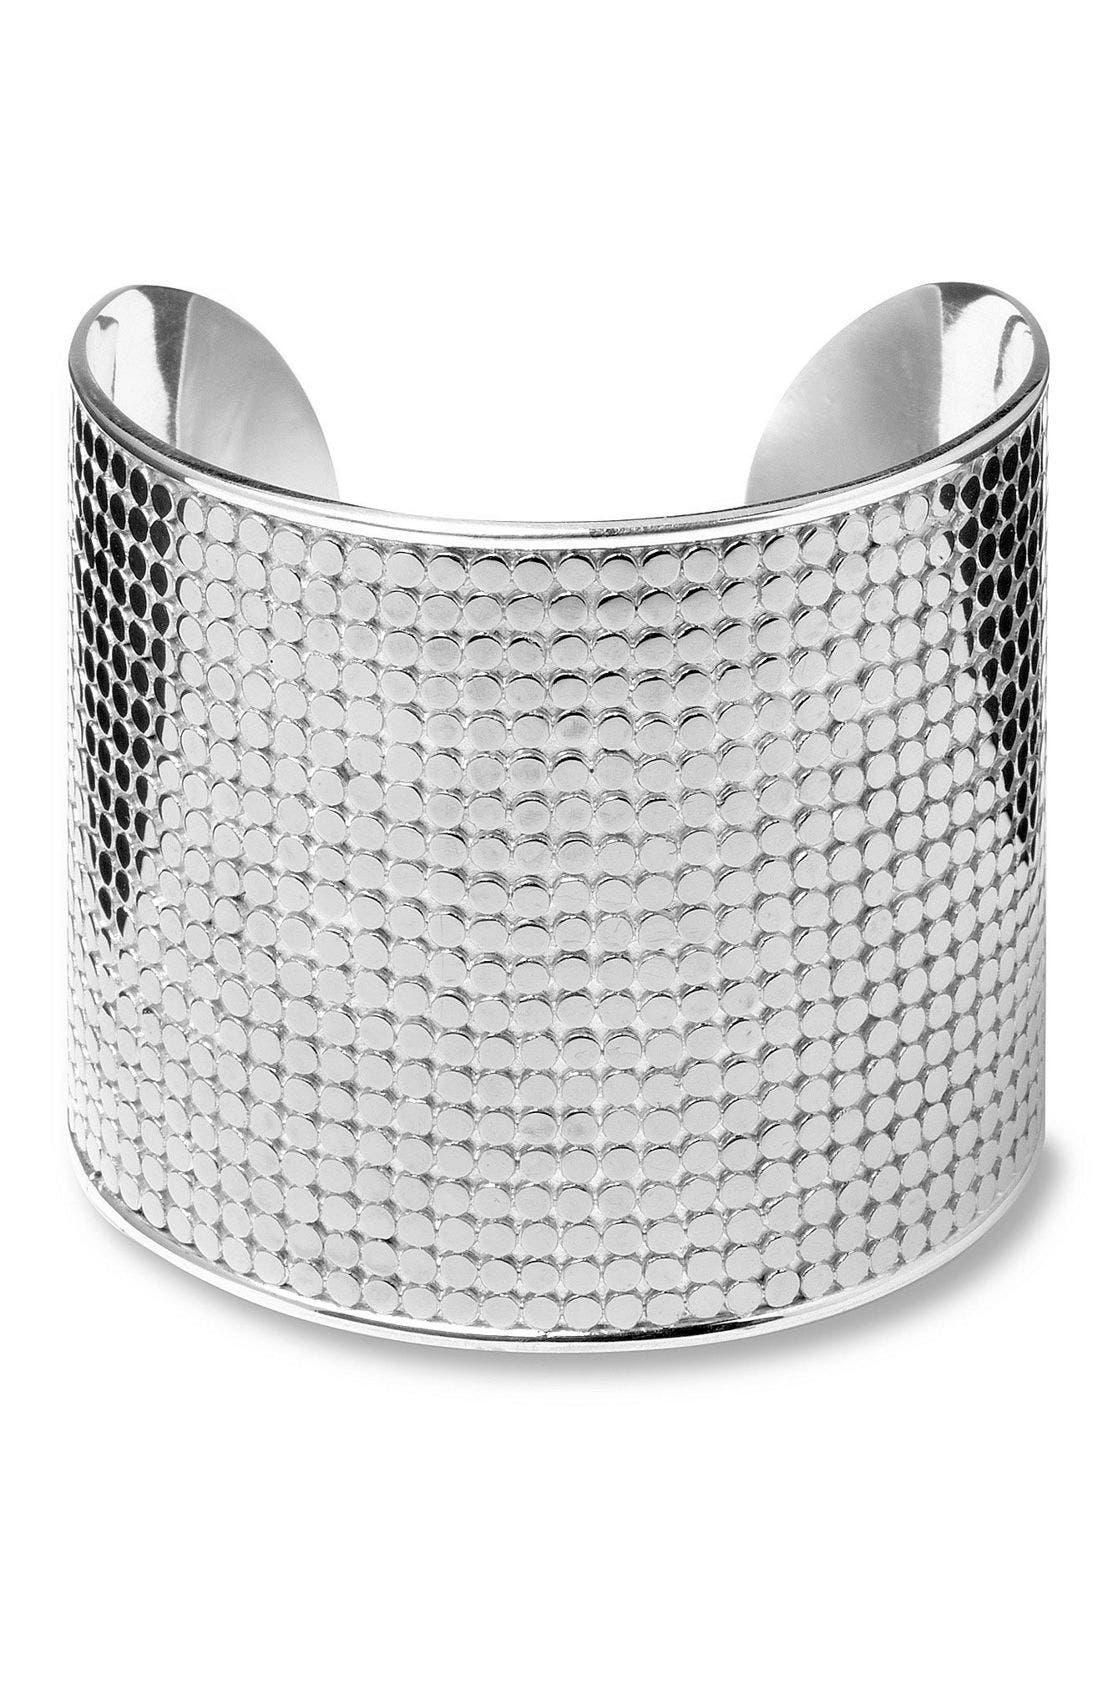 Main Image - Anna Beck 'Bali' Cuff Bracelet